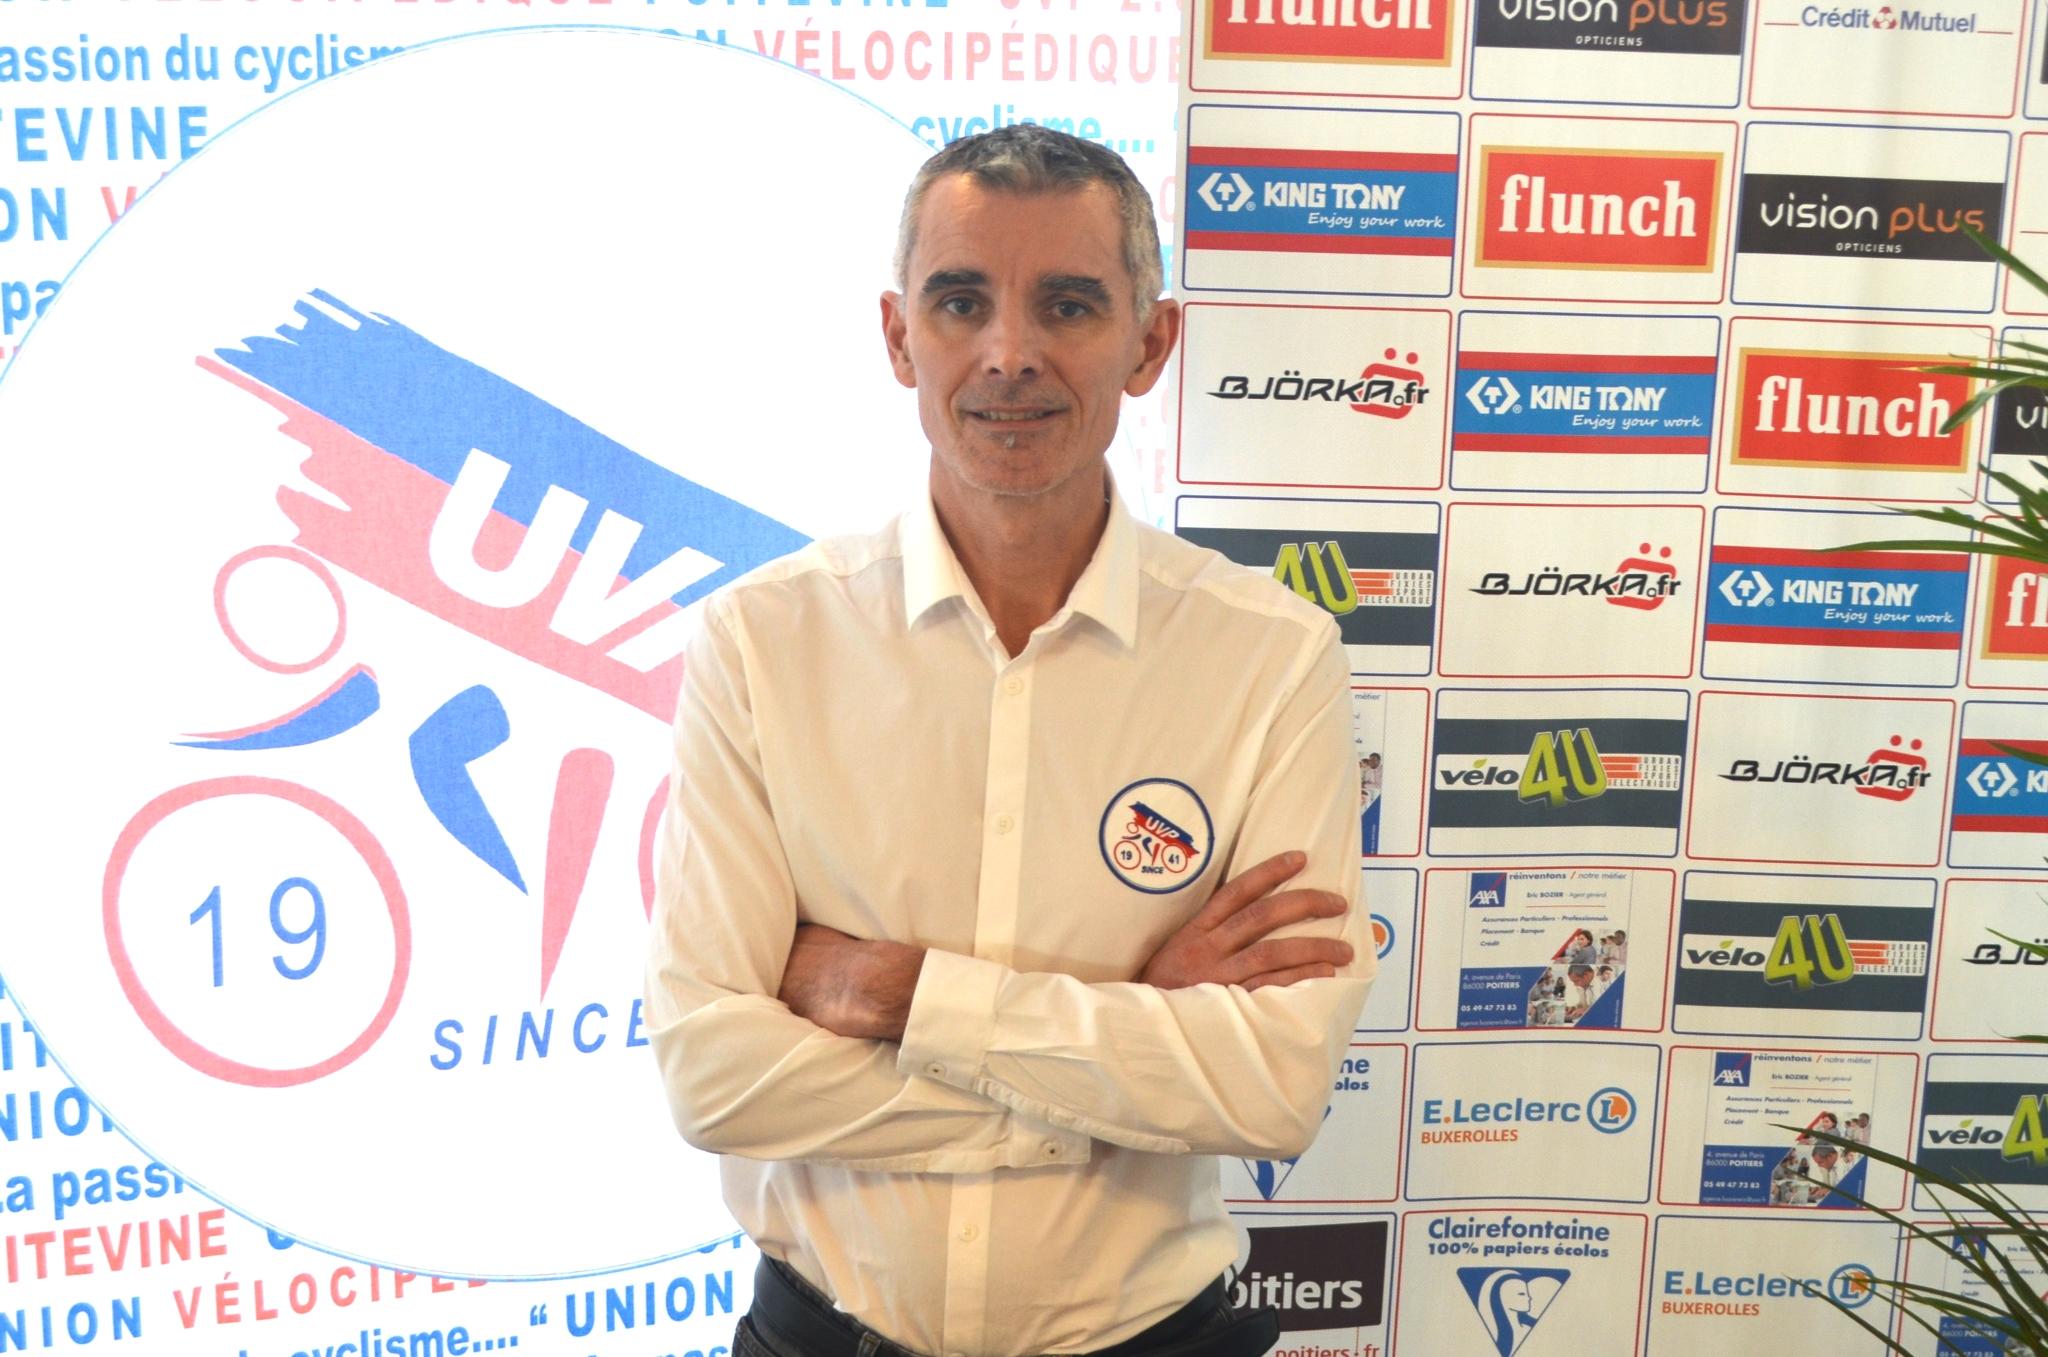 Cyril HIVERT